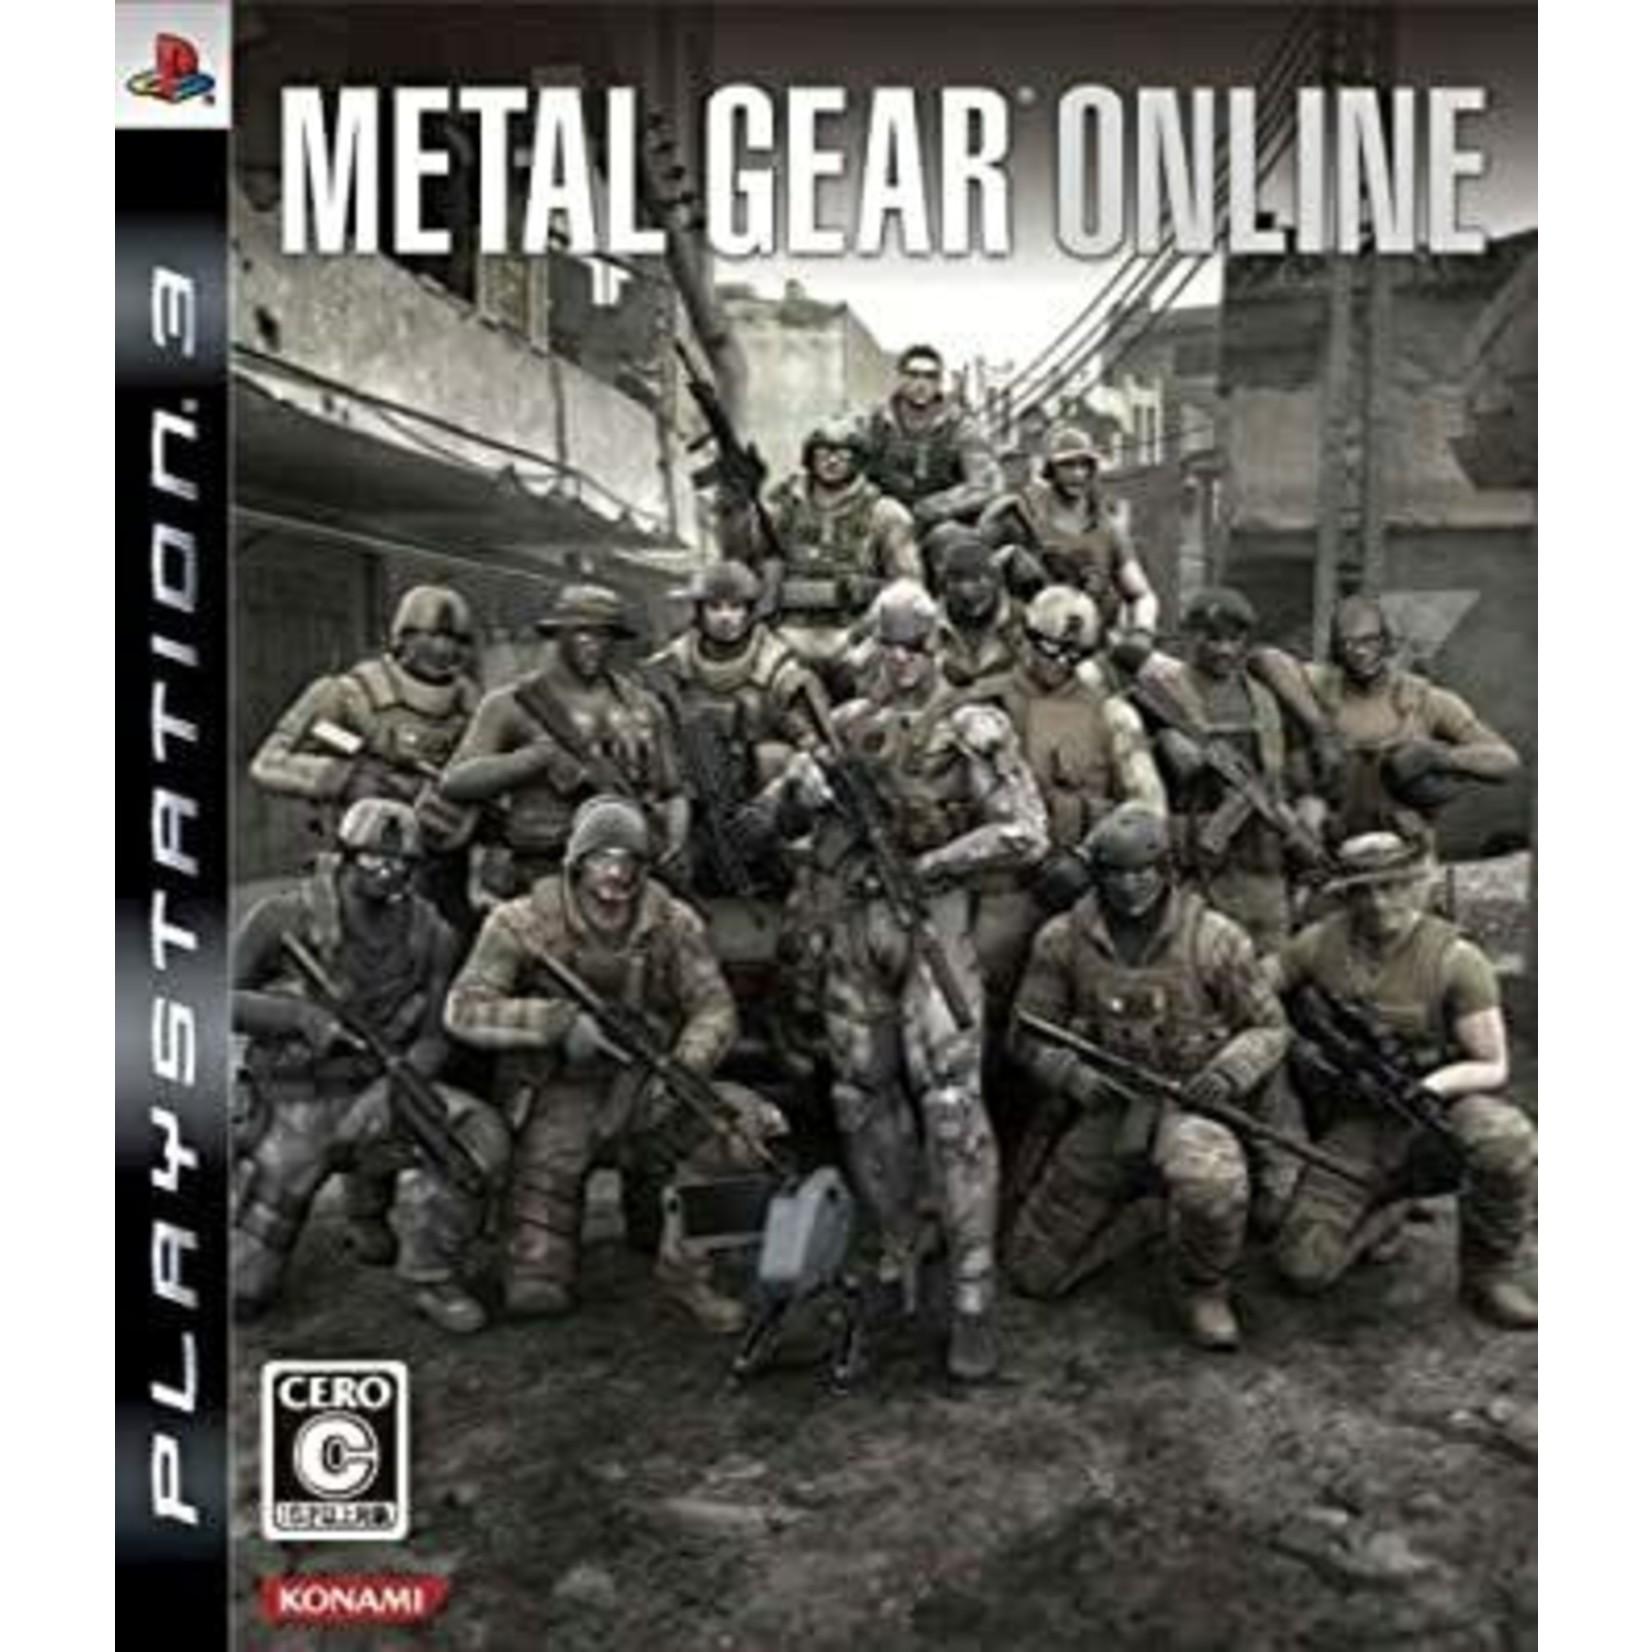 IMPORT-ps3u-Metal Gear Online